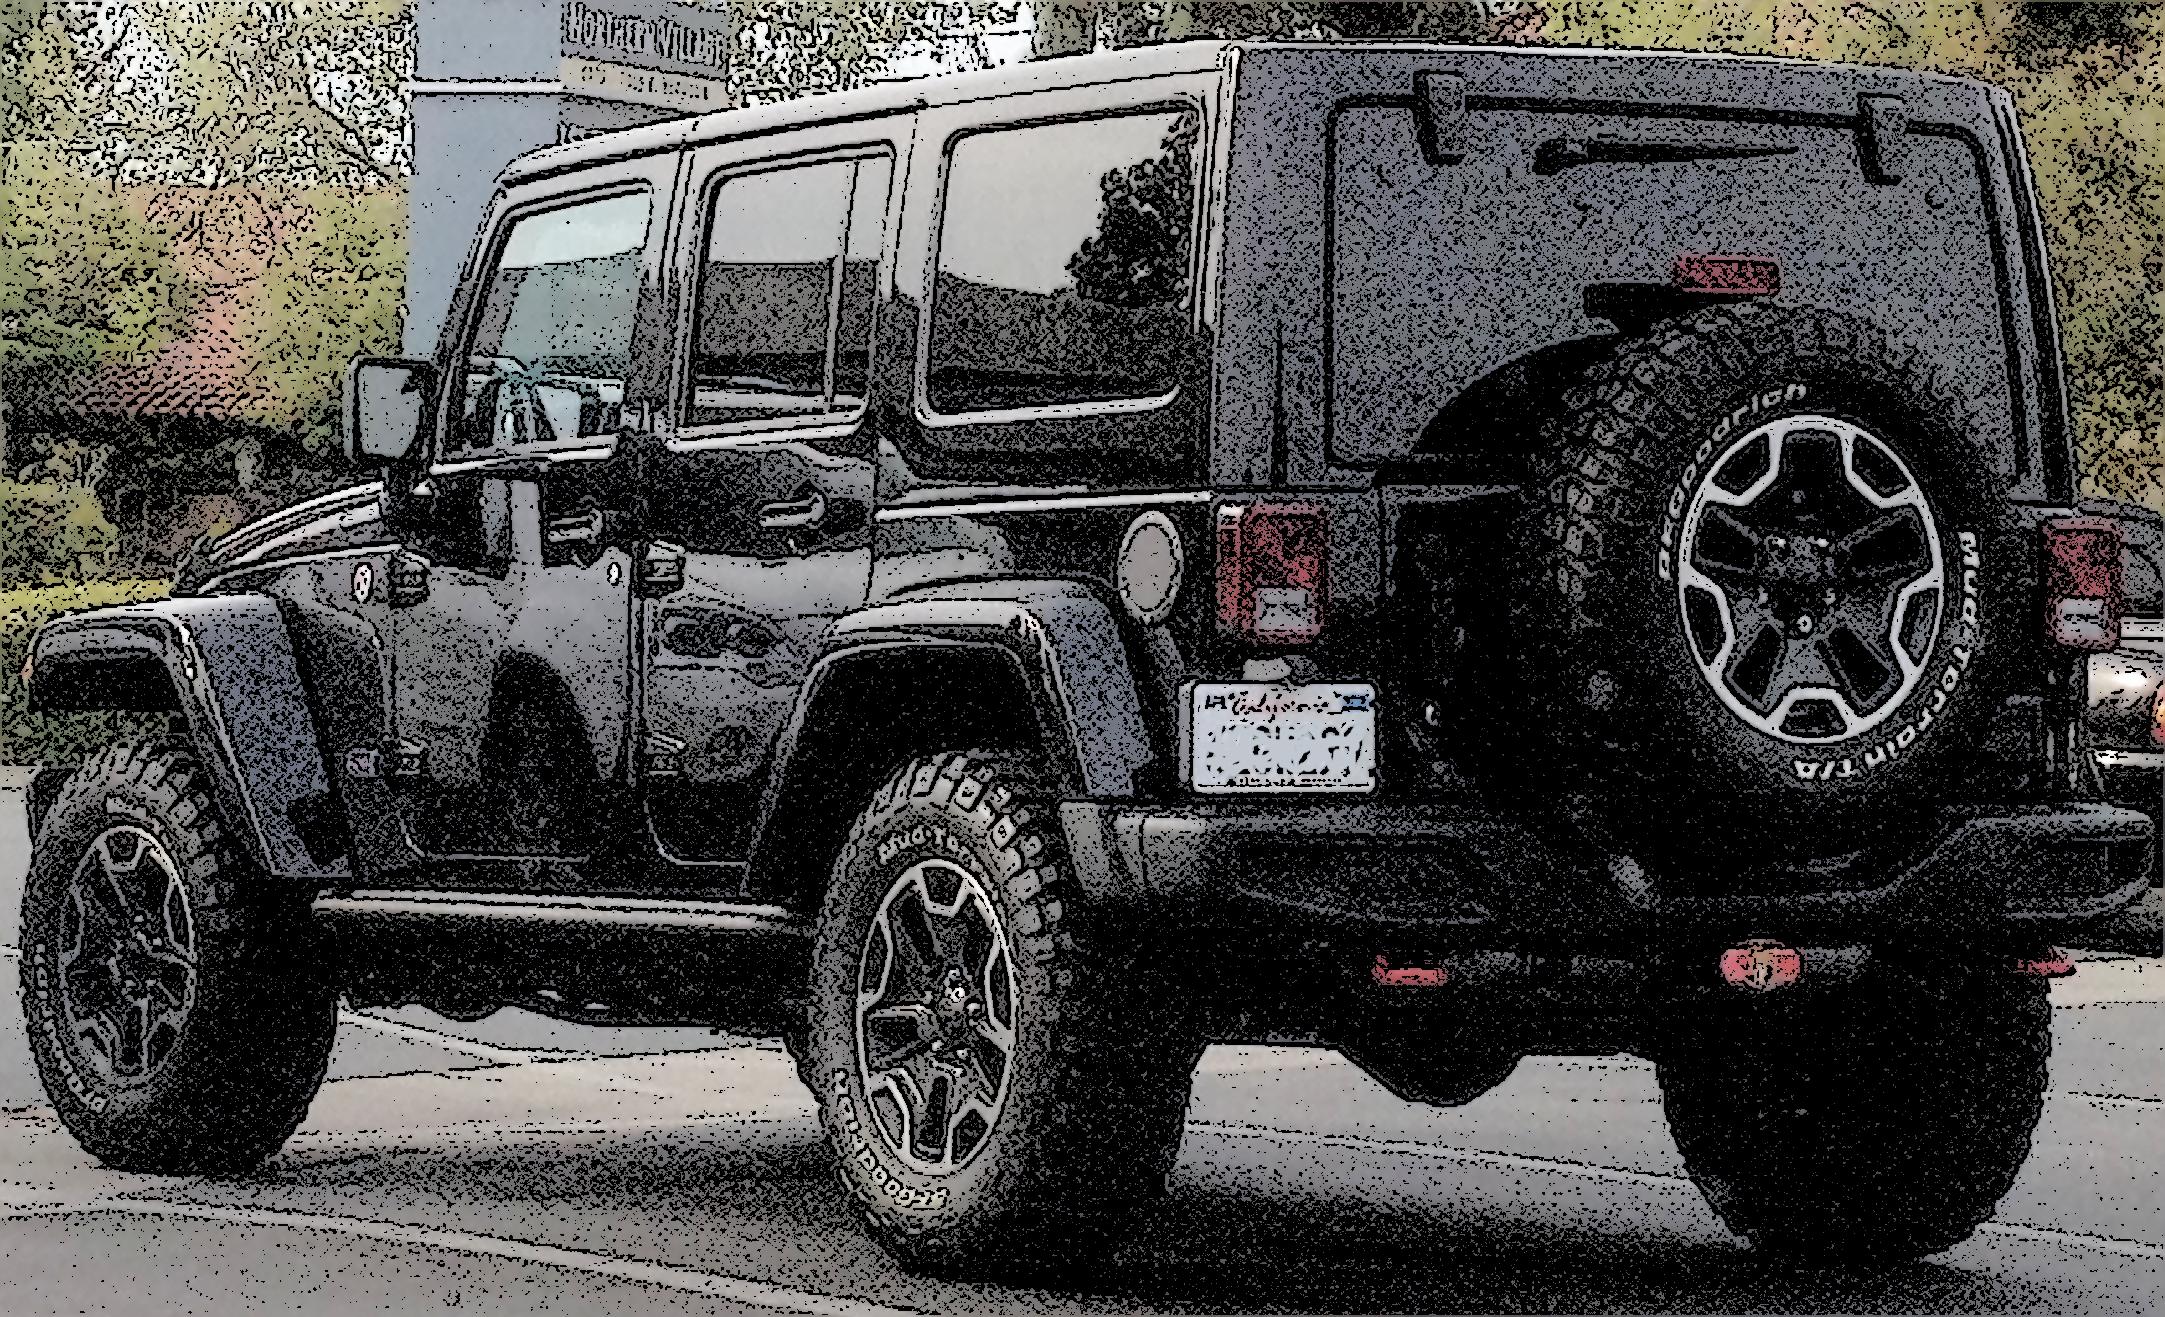 Ink Sketch Effect On A Black Jeep Wrangler Dream Cars Black